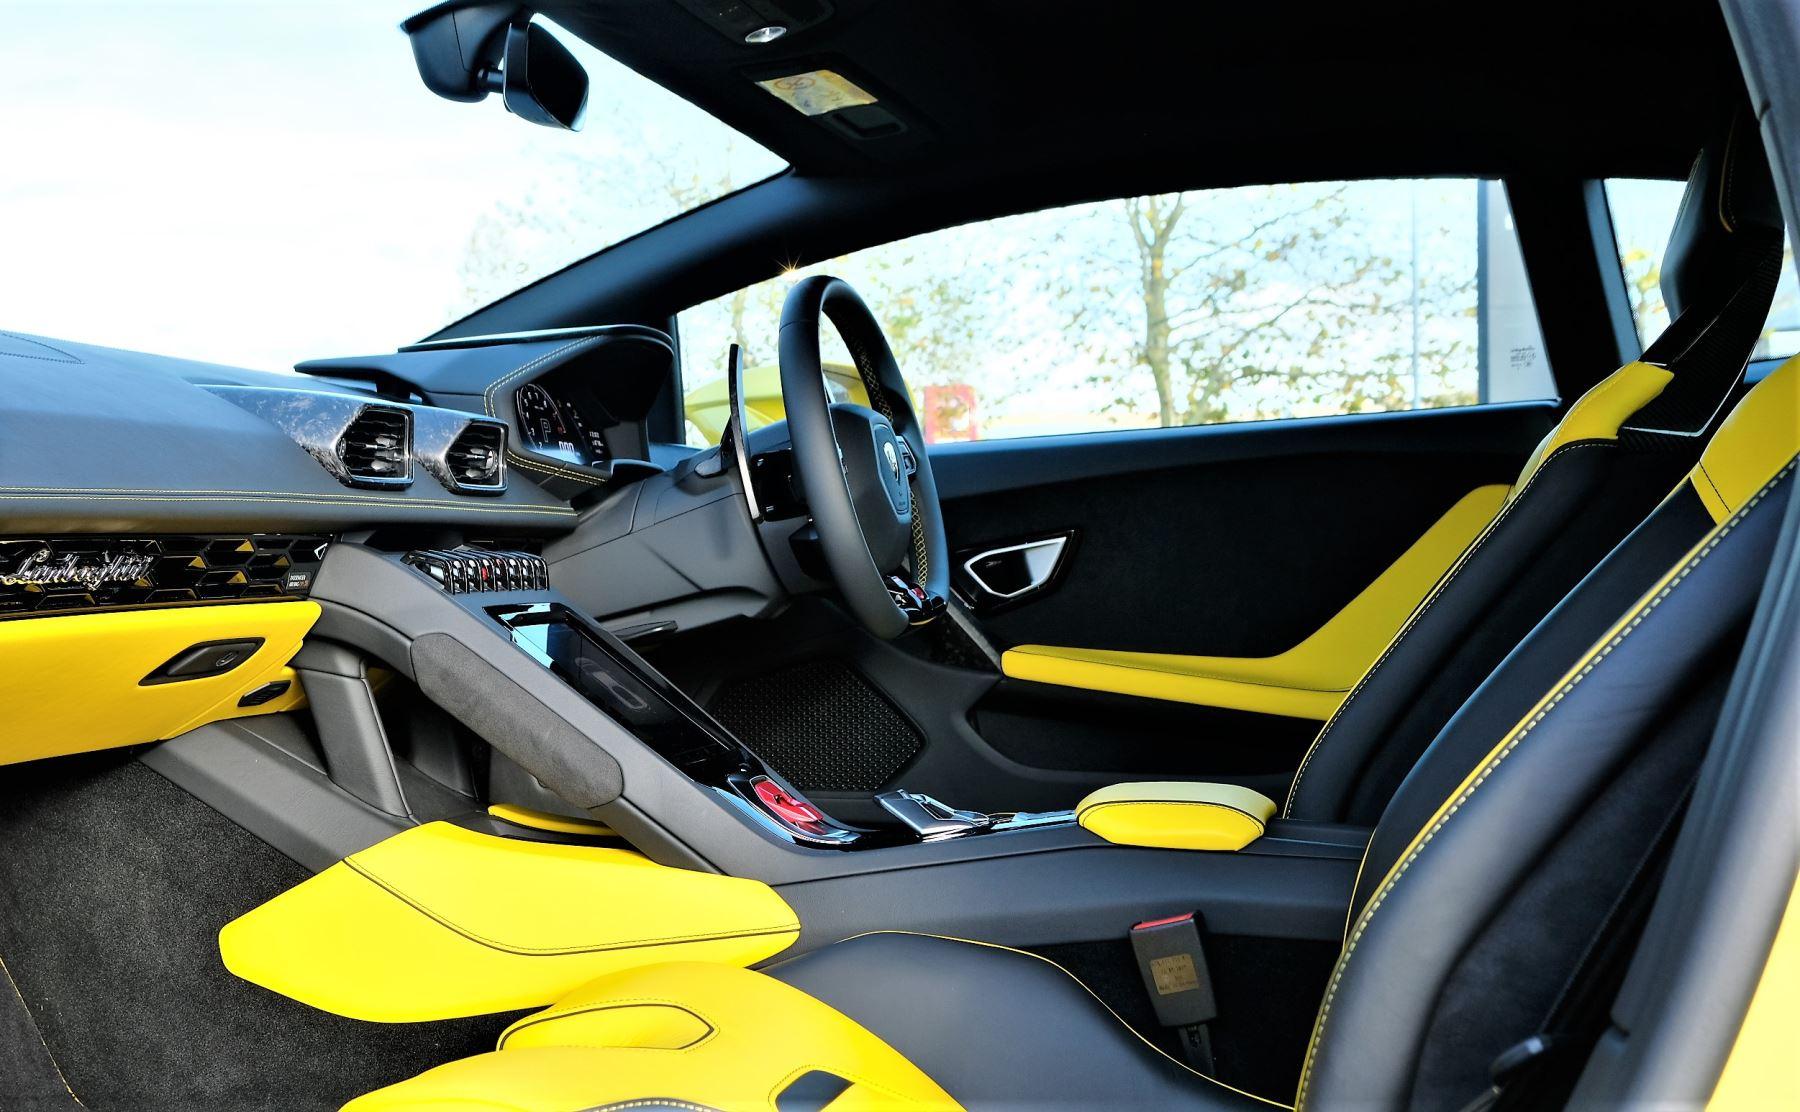 Lamborghini Huracan EVO 5.2 V10 610 2dr Auto RWD image 13